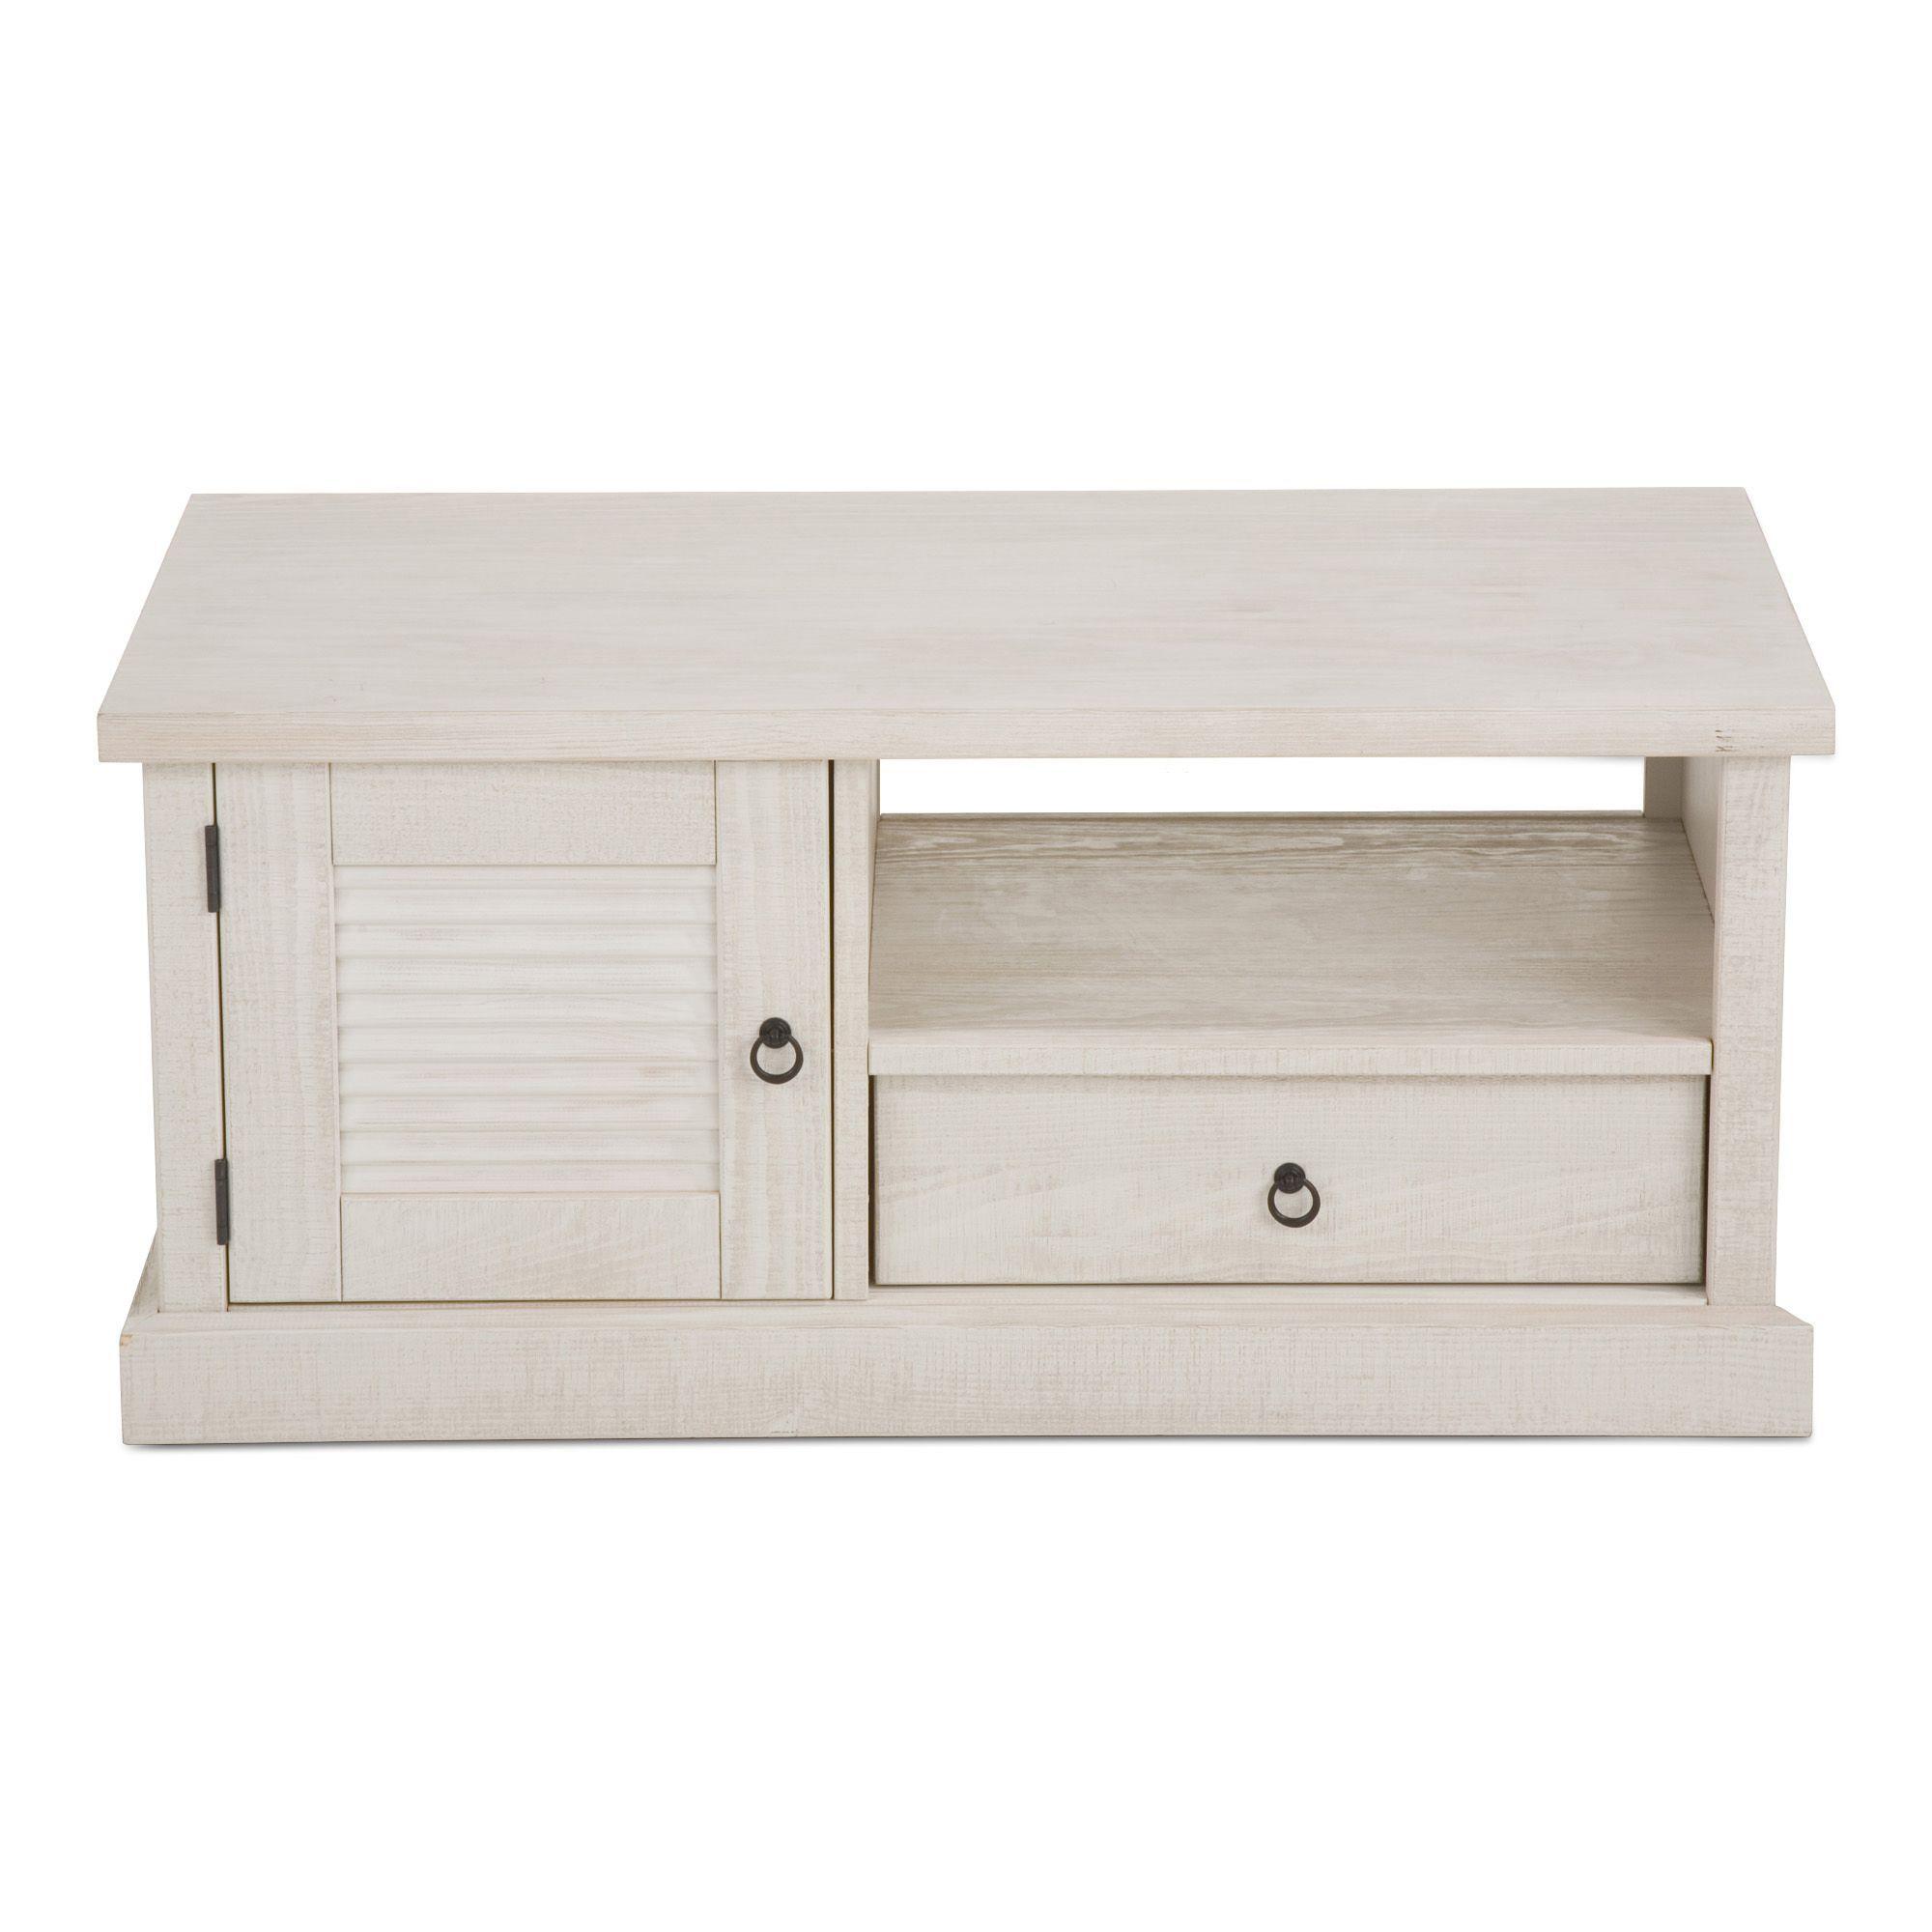 08fe6b95dea1f80c9ccc45839302e5cd Luxe De Mini Table Basse Concept